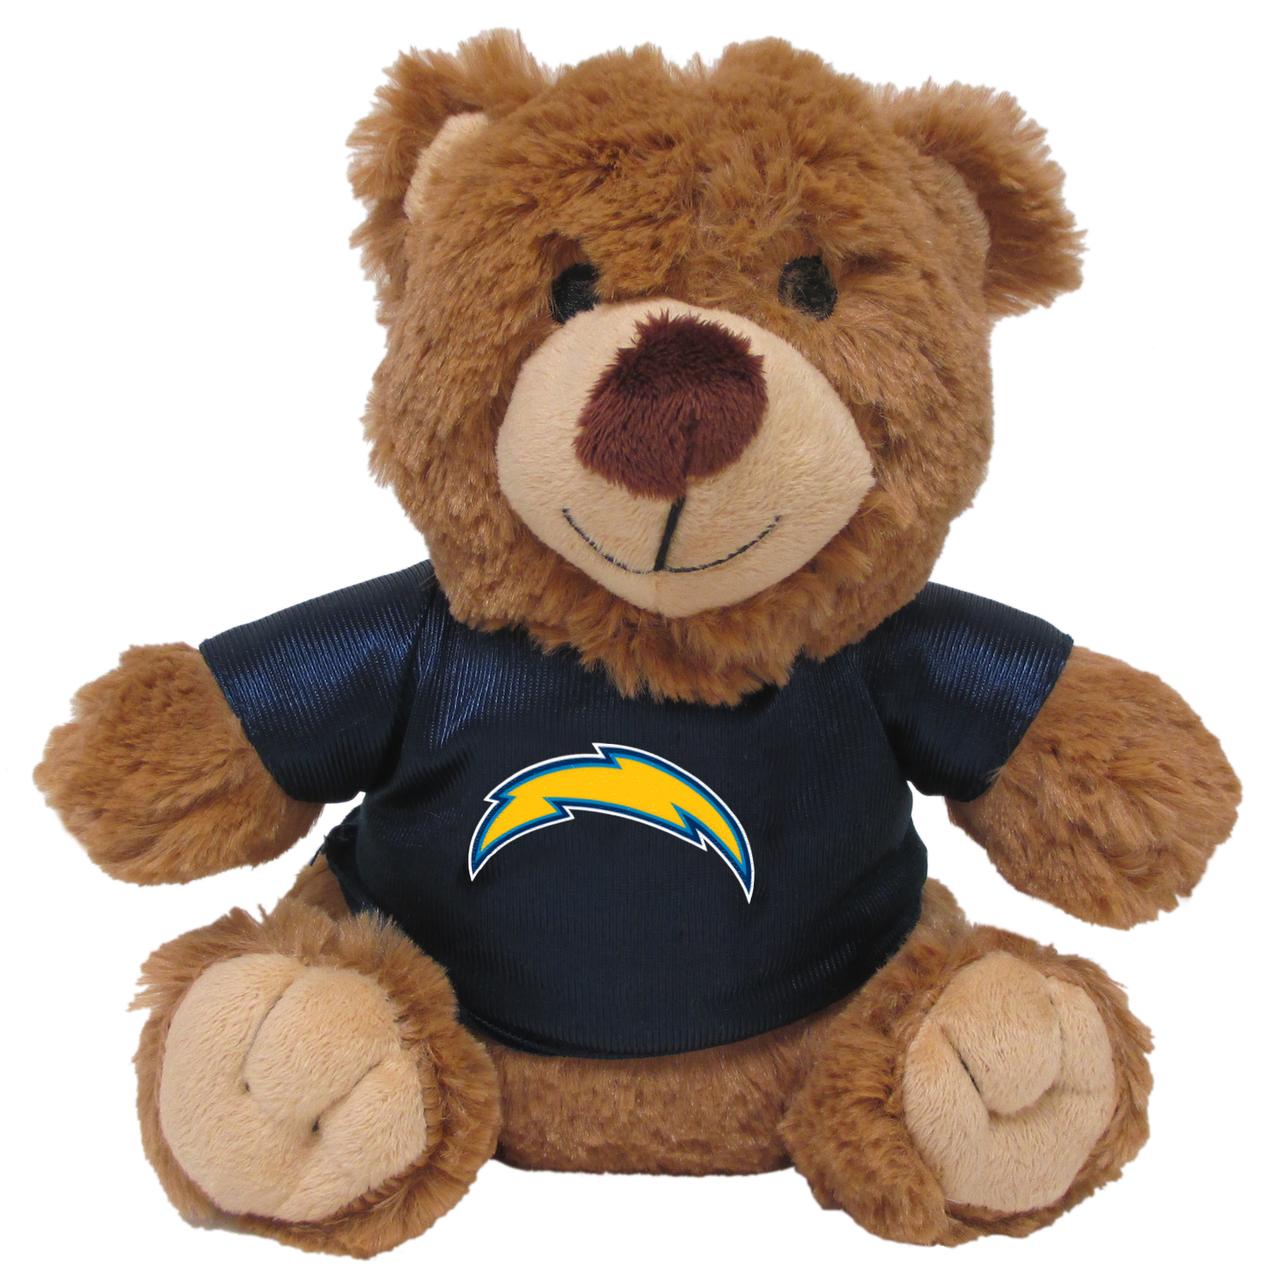 San Diego Chargers NFL Teddy Bear Dog Toy SDC-3119